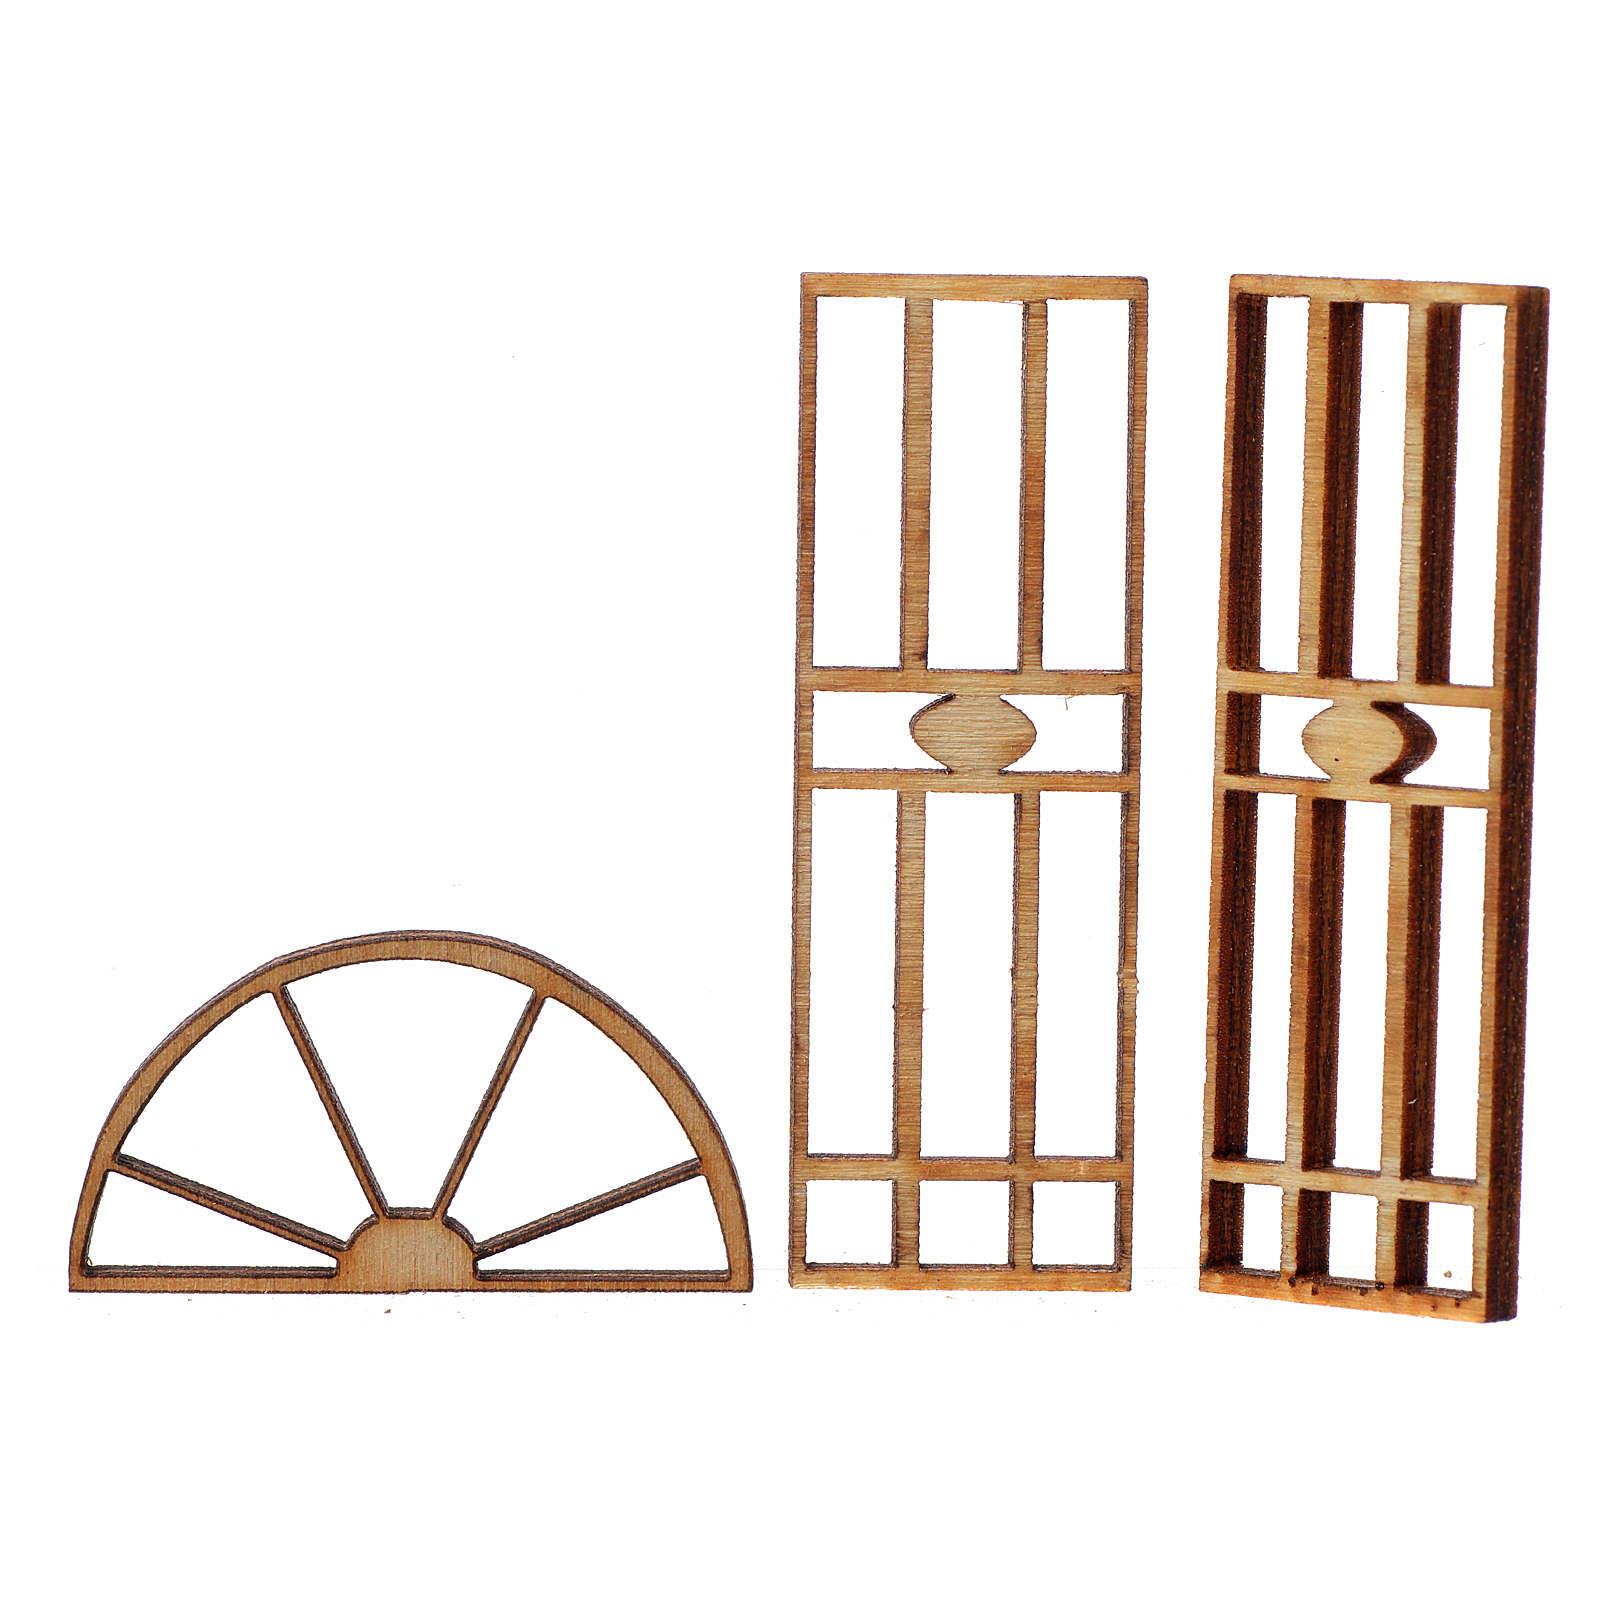 Nativity accessory, wooden gate, 3 pieces, 7x3.5cm 4